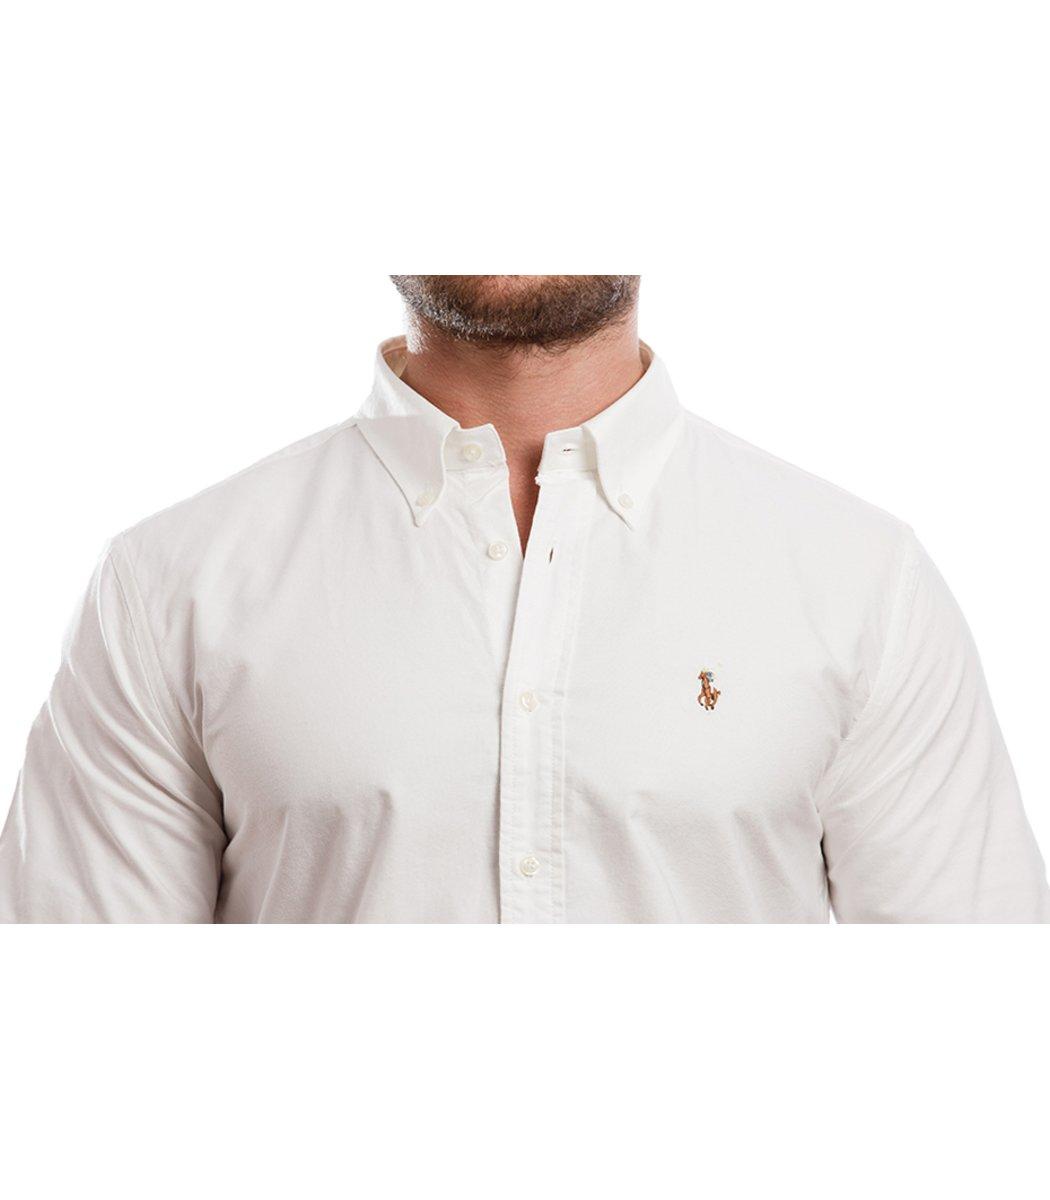 Рубашка POLO Ralph Lauren RR3 (Белый) - Белый - Вид 5